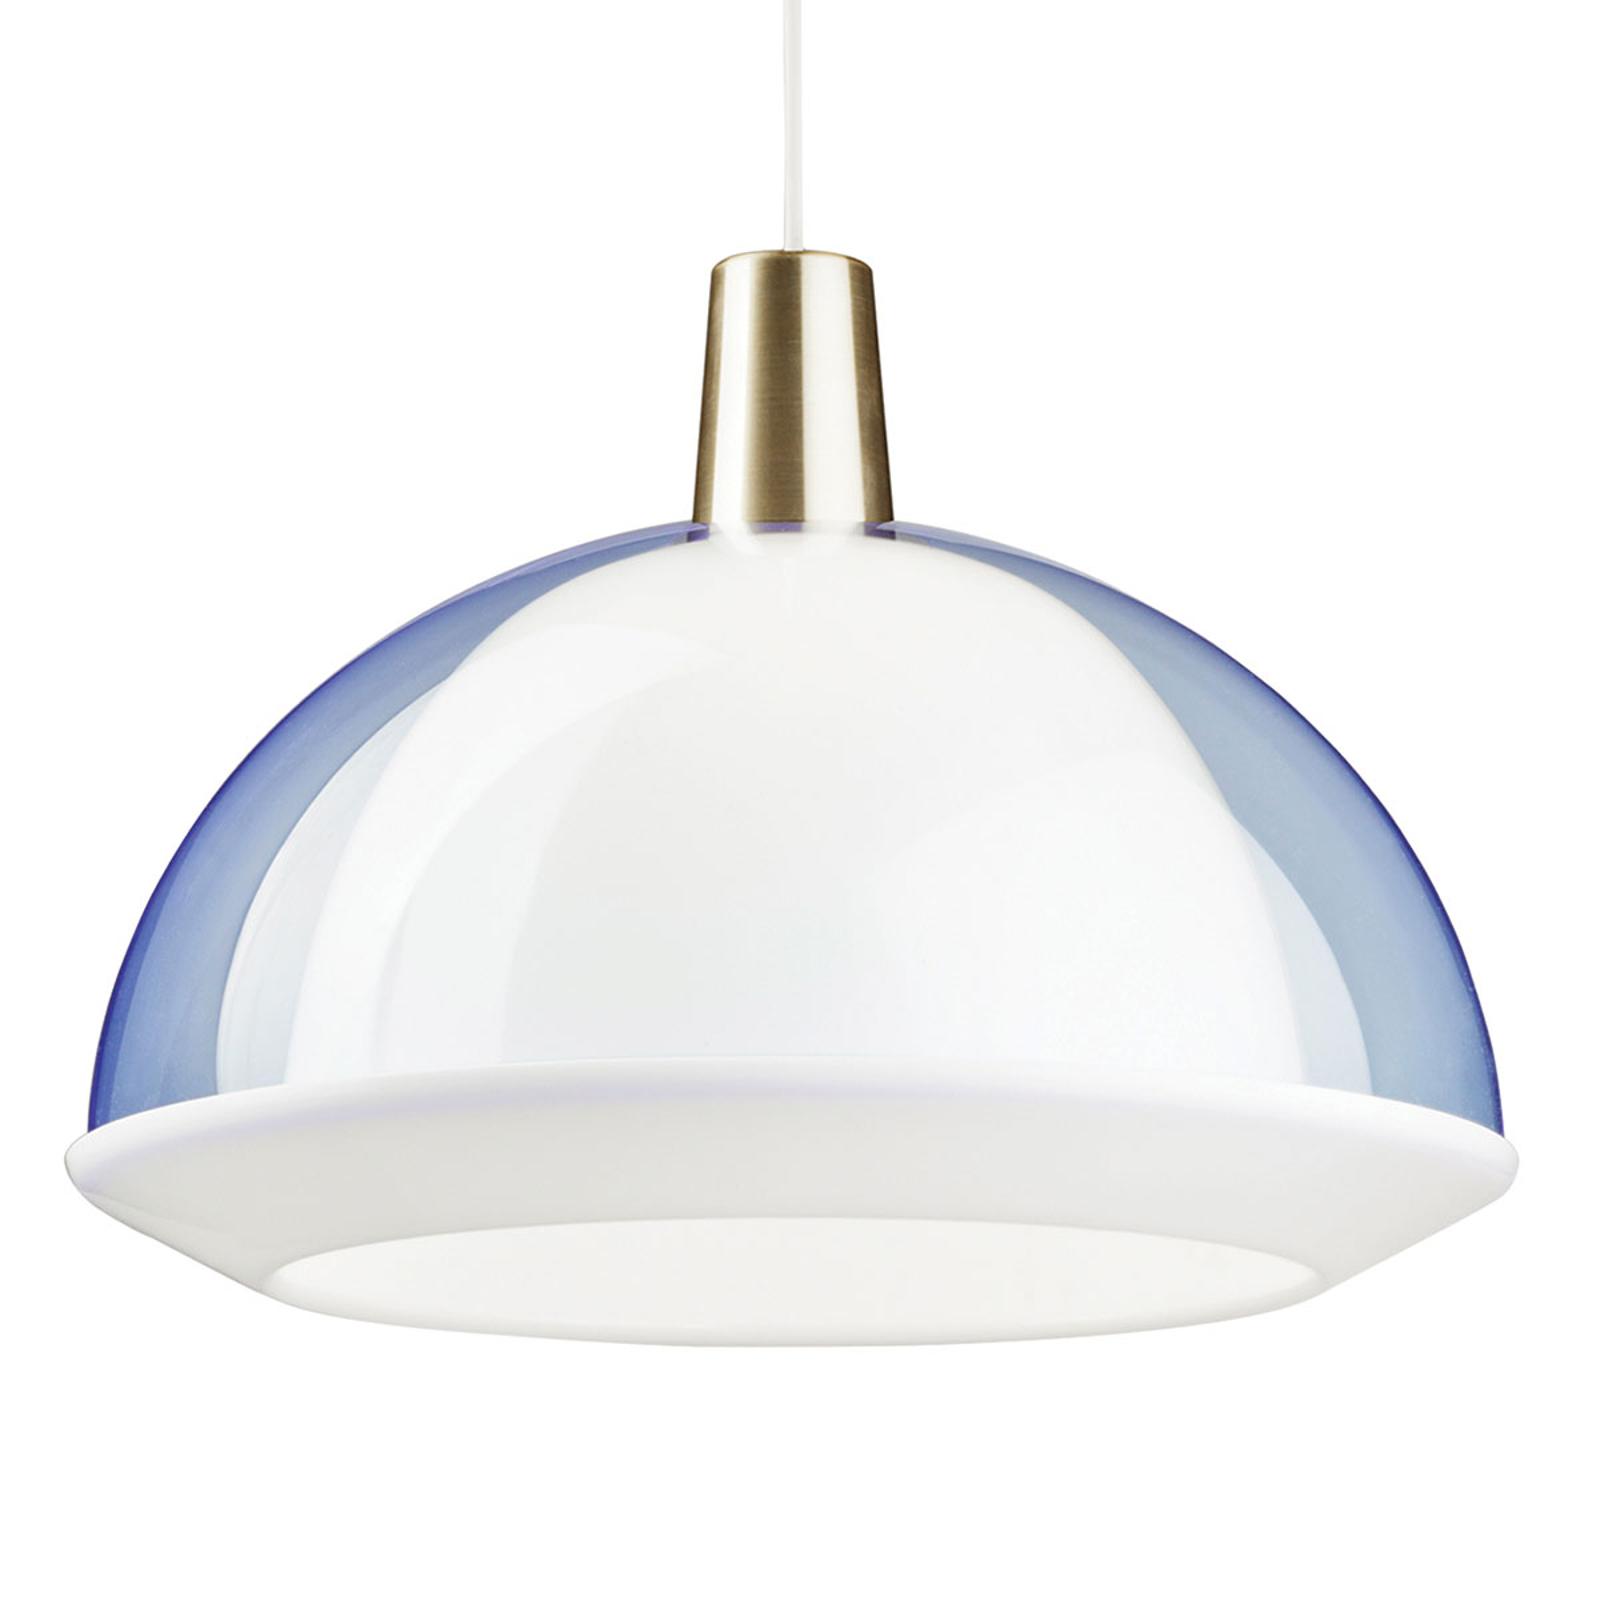 Innolux Kuplat 400 hanglamp 40 cm aquamarijn